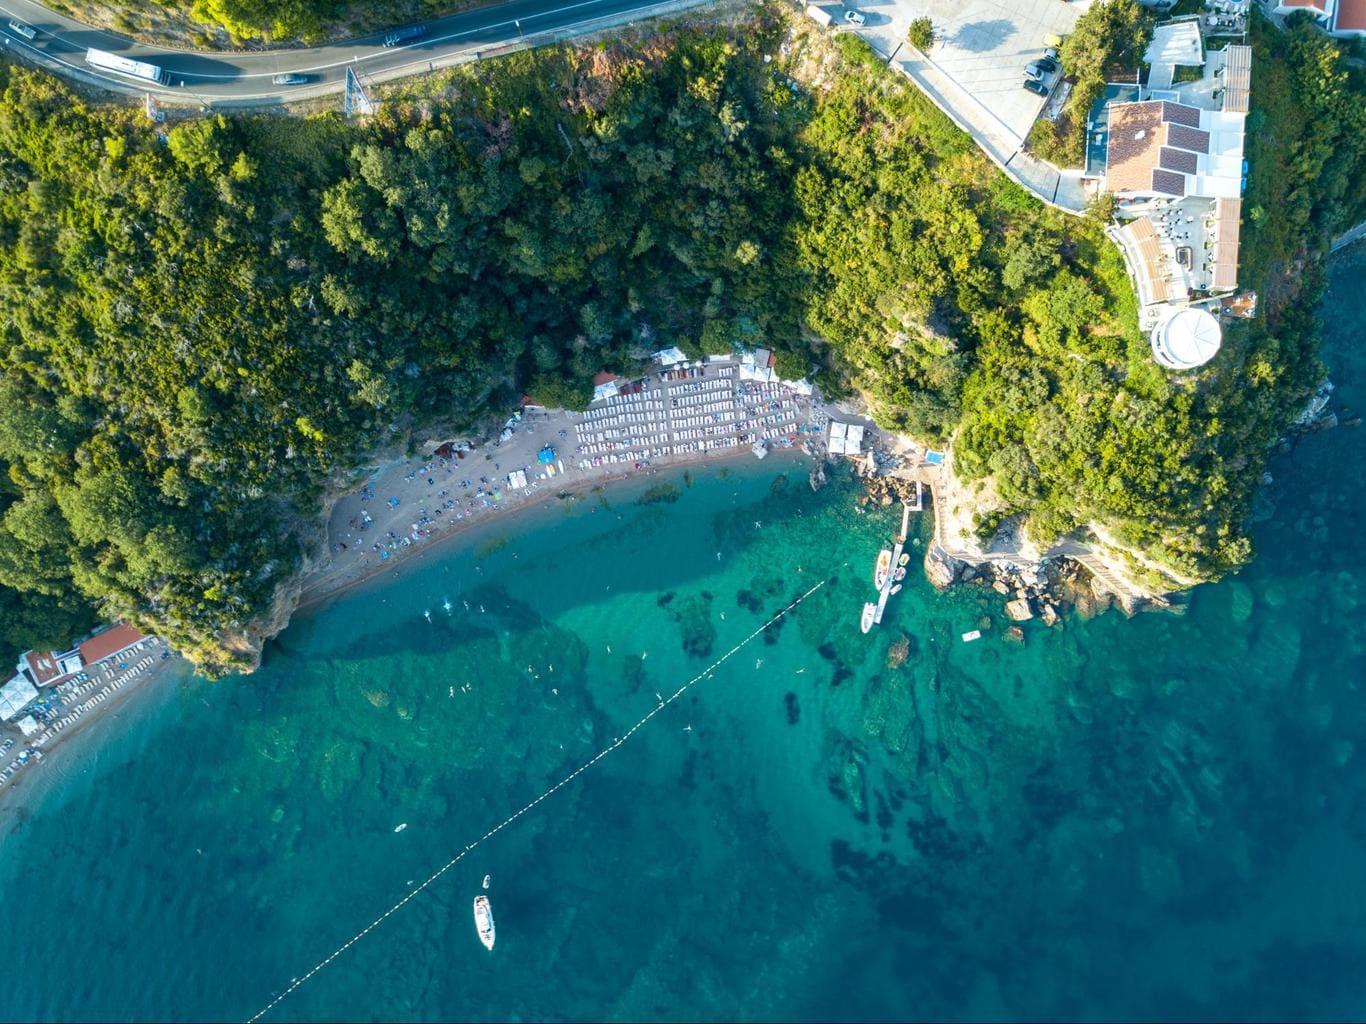 Drone shot of the larger part of Mogren Beach